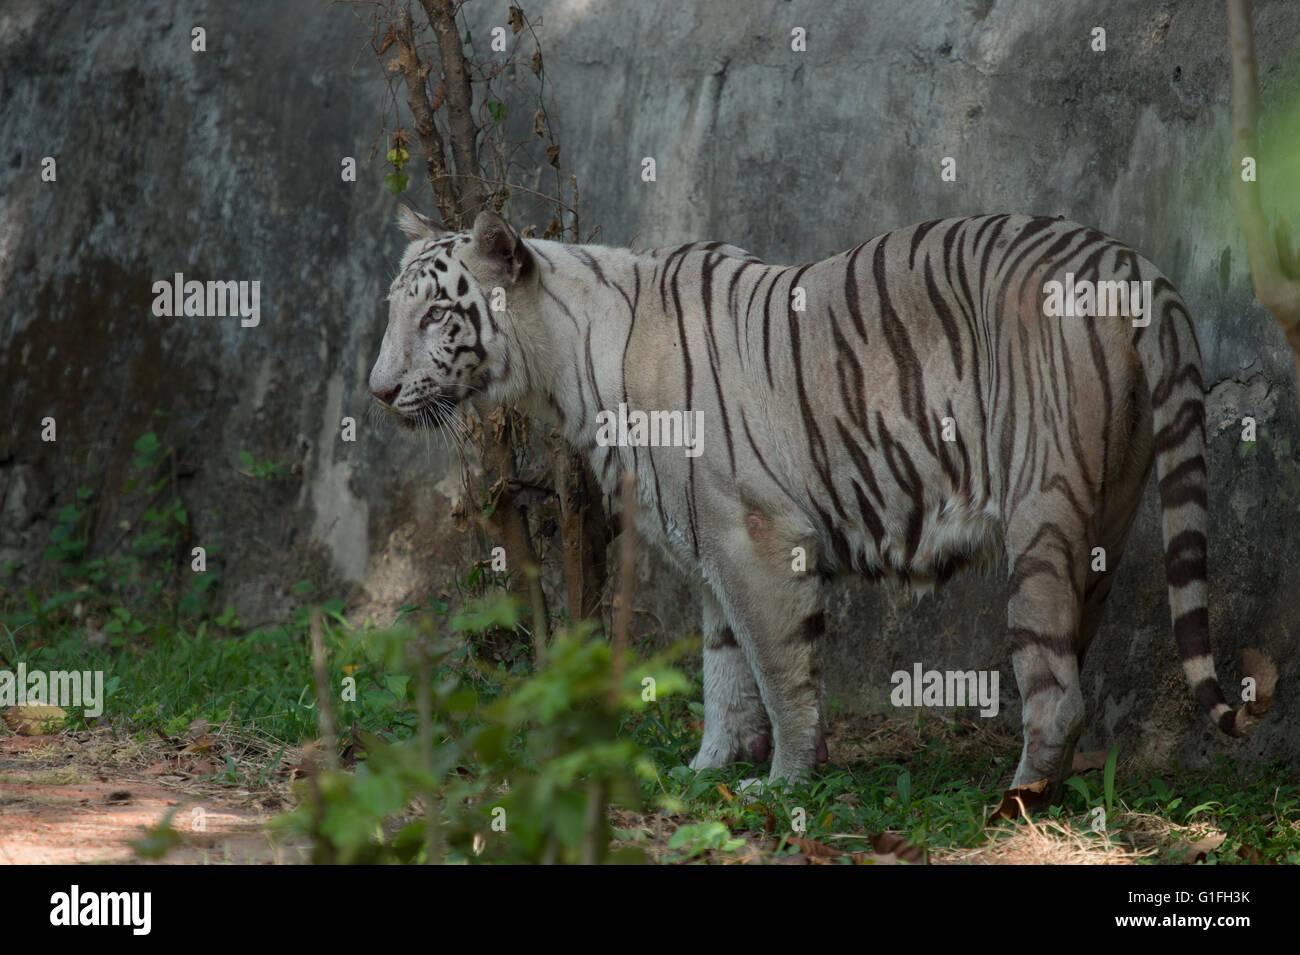 White Royal Bengal tiger (Panthera tigris tigris), Felidae, Asia Stock Photo